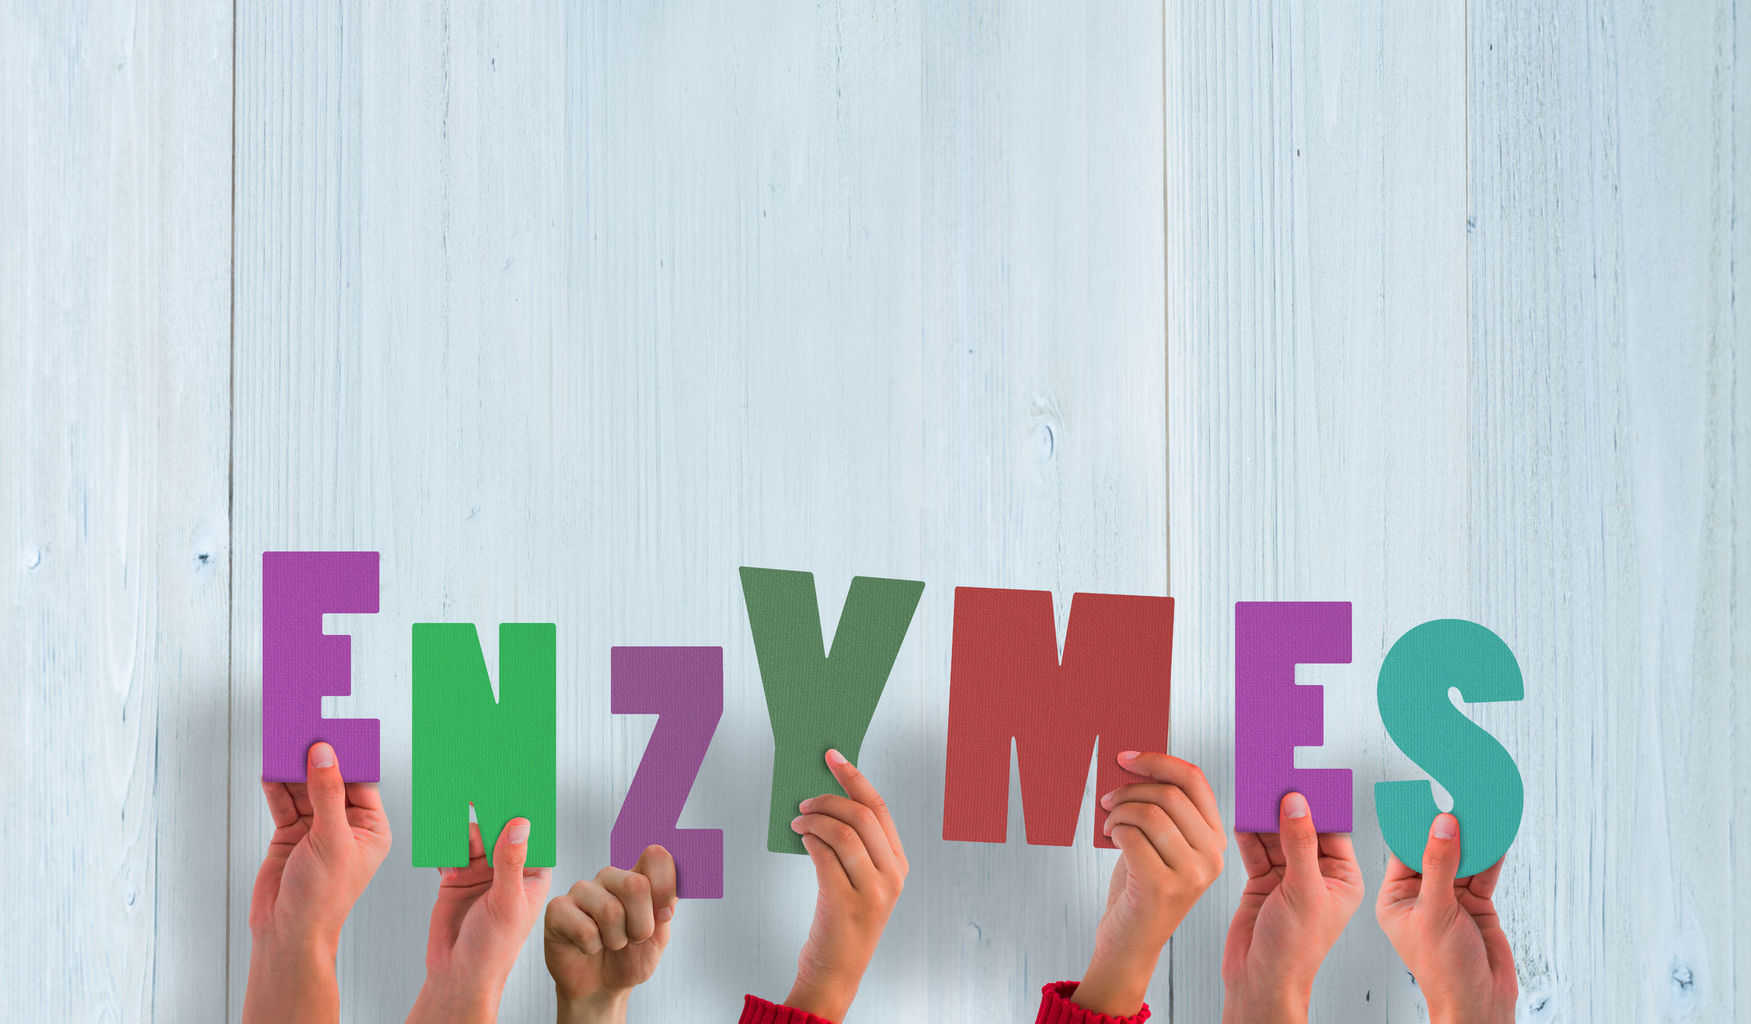 Enzyme health benefits